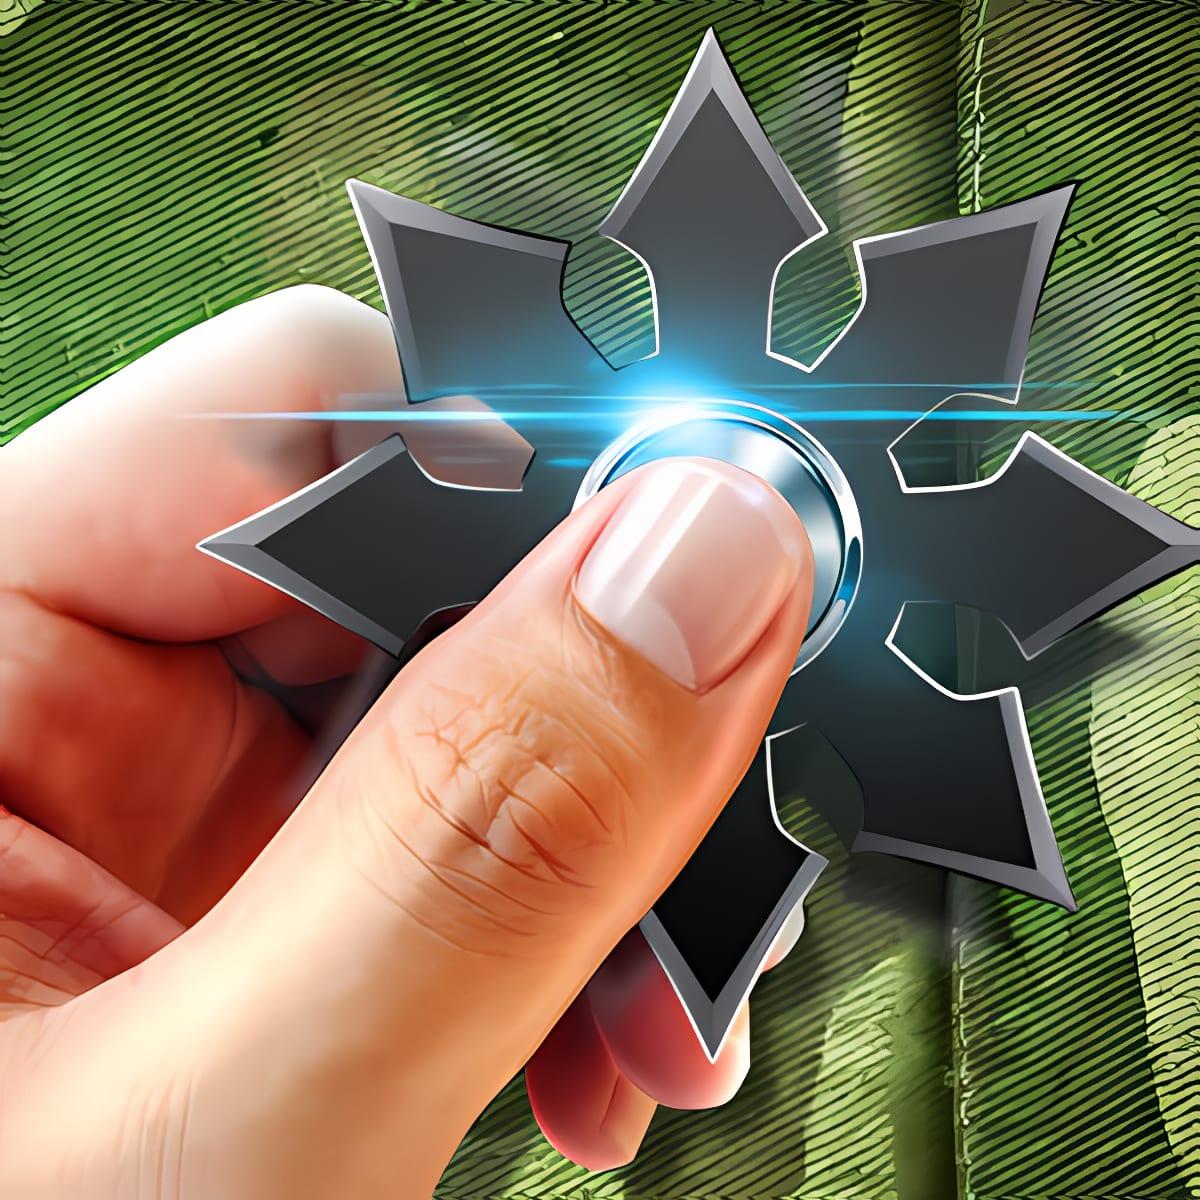 Weapons fidget hand spinner 1.0